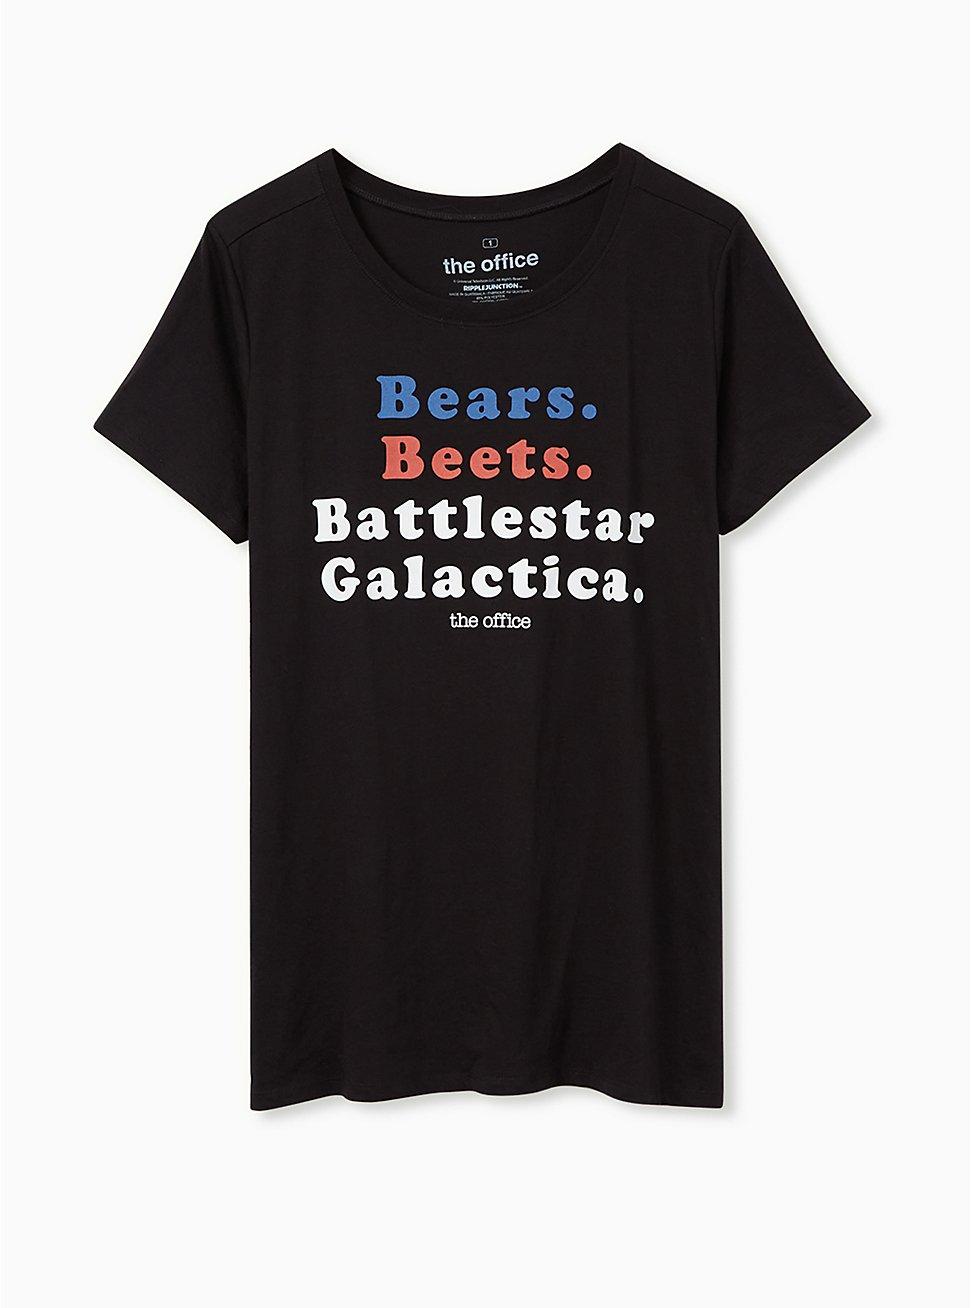 Plus Size The Office Battlestar Galactica Slim Fit Graphic Tee - Black, DEEP BLACK, hi-res